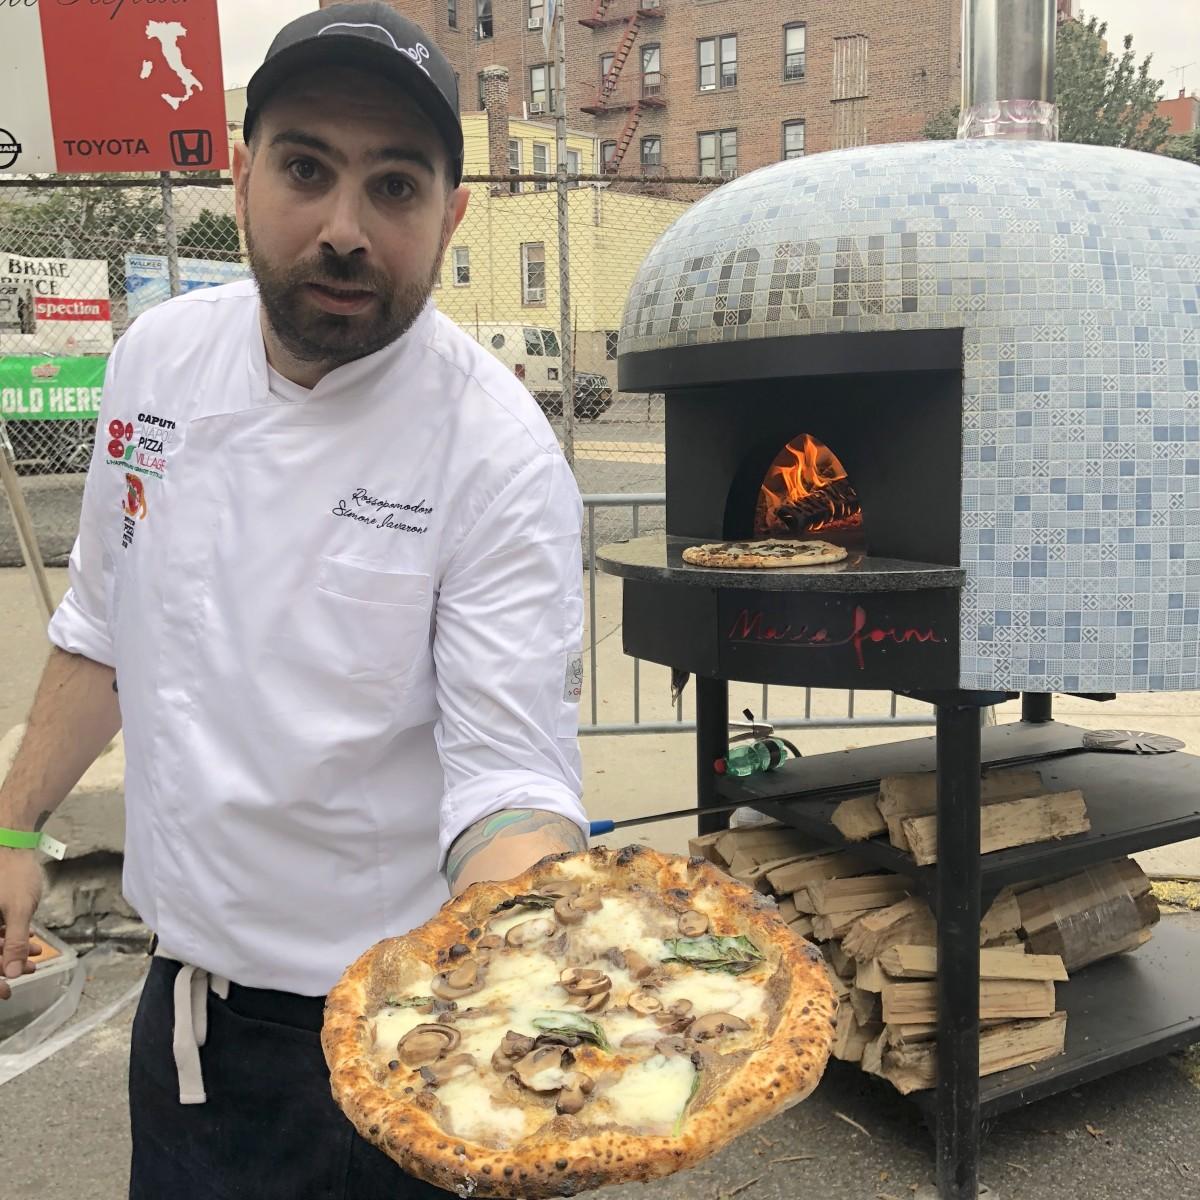 Scene from the 2019 New York Pizza Festival.